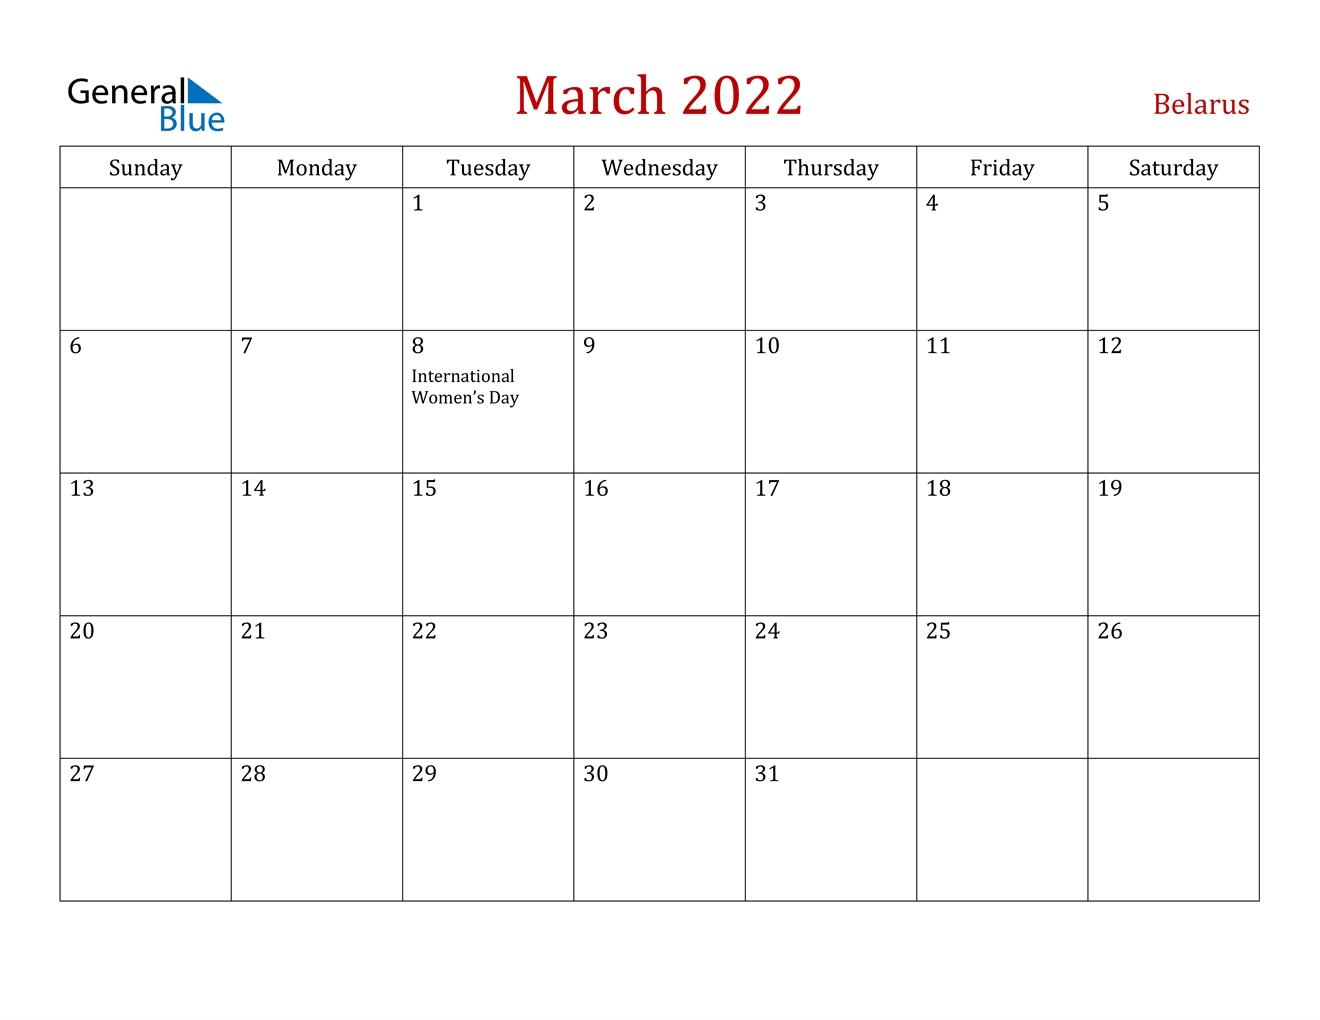 March 2022 Calendar - Belarus